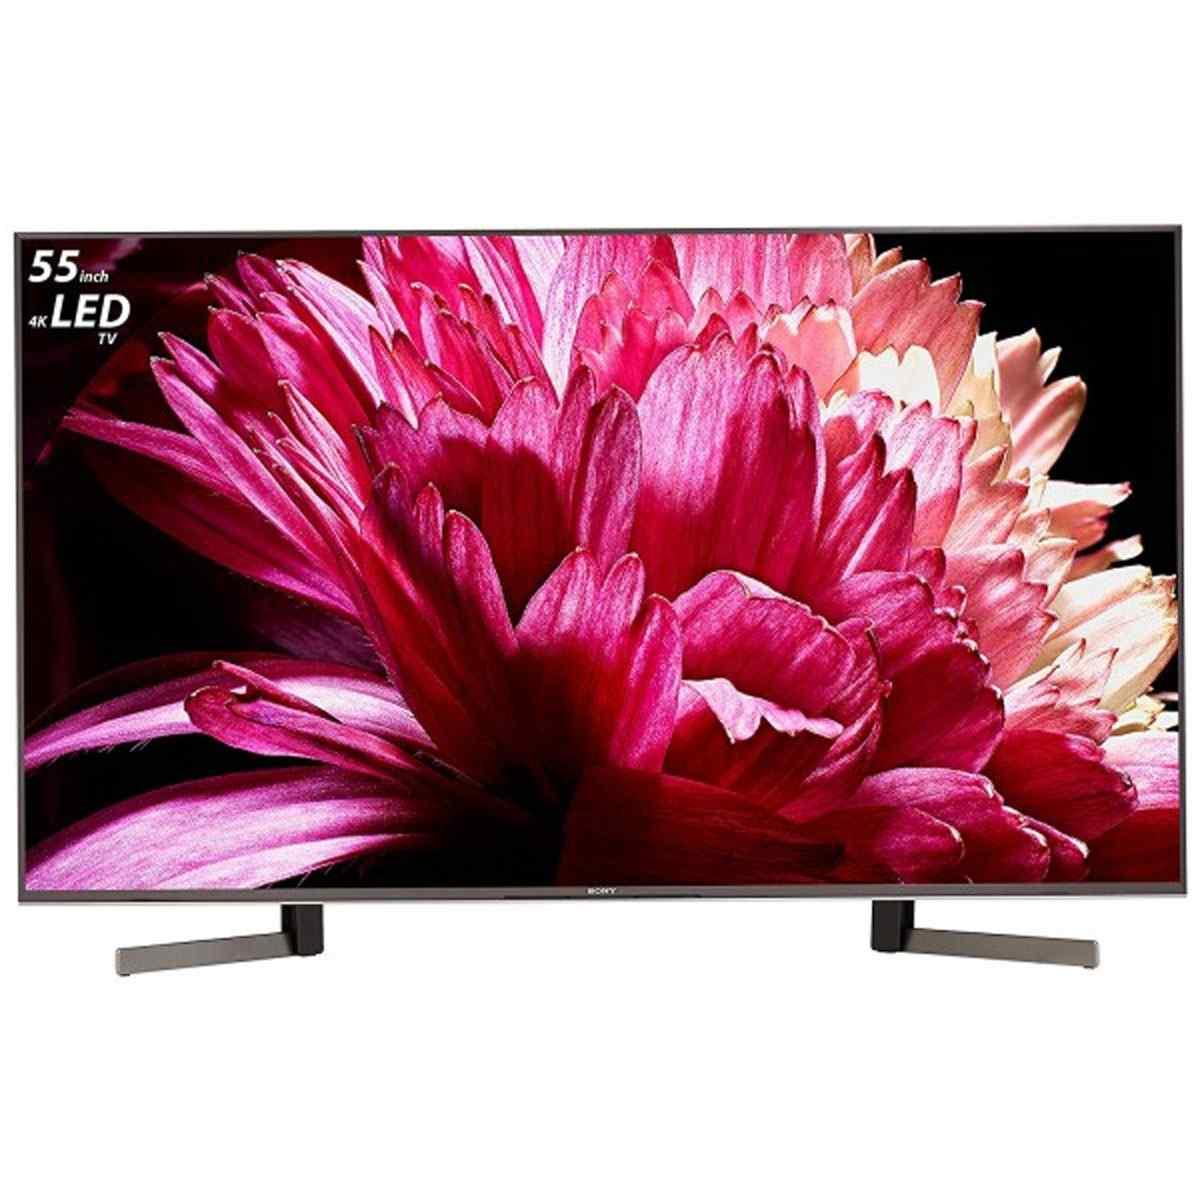 Sony Bravia 55 Inch FHD Smart LED TV (KD55X9500G)